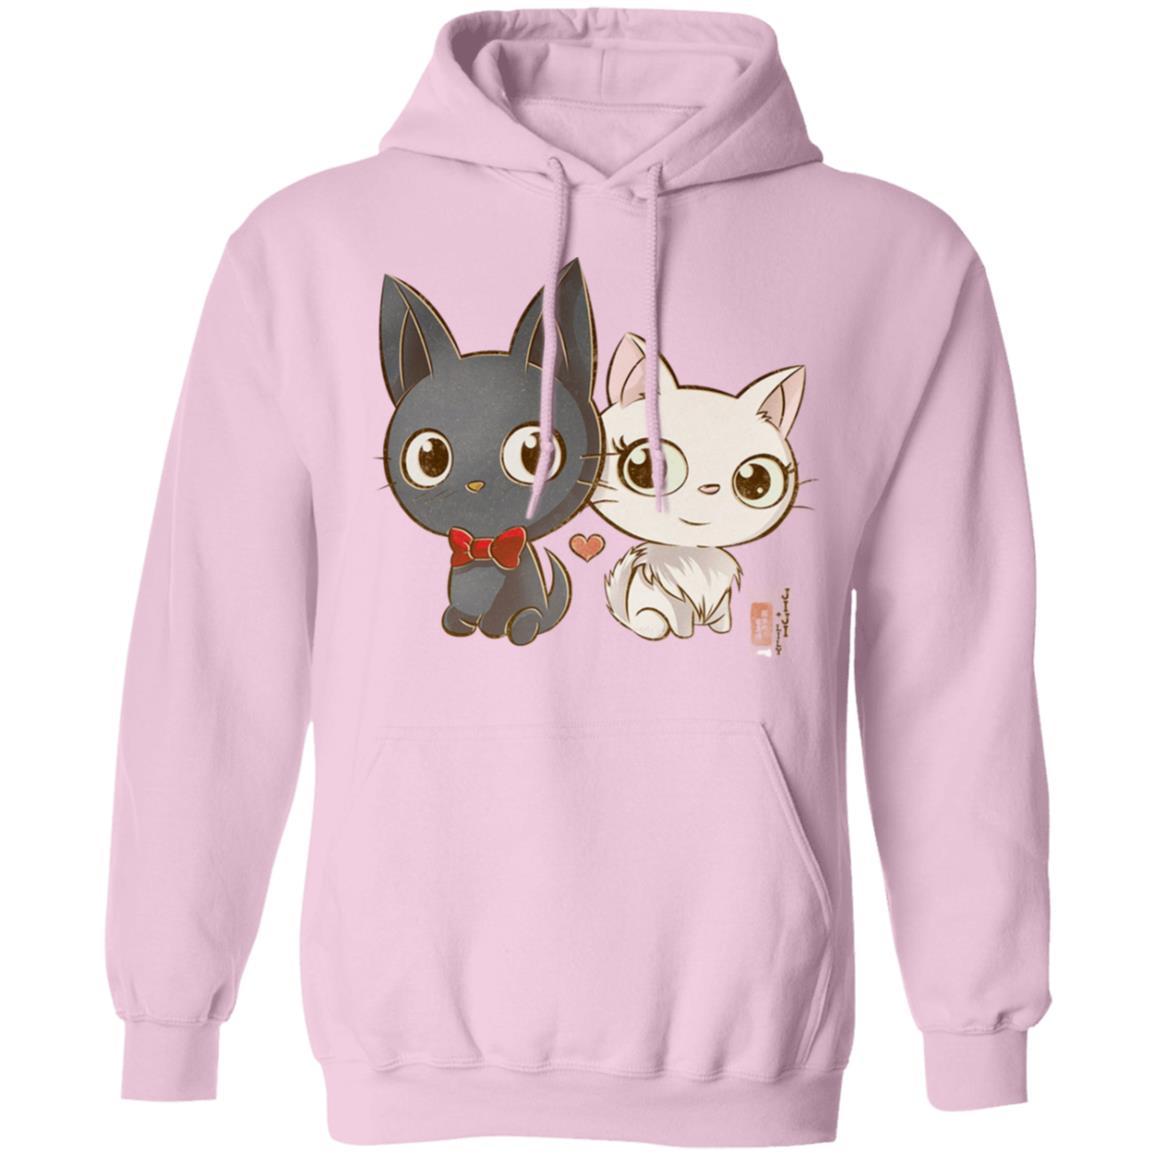 Kiki's Delivery Service – Jiji and Lily Chibi Hoodie